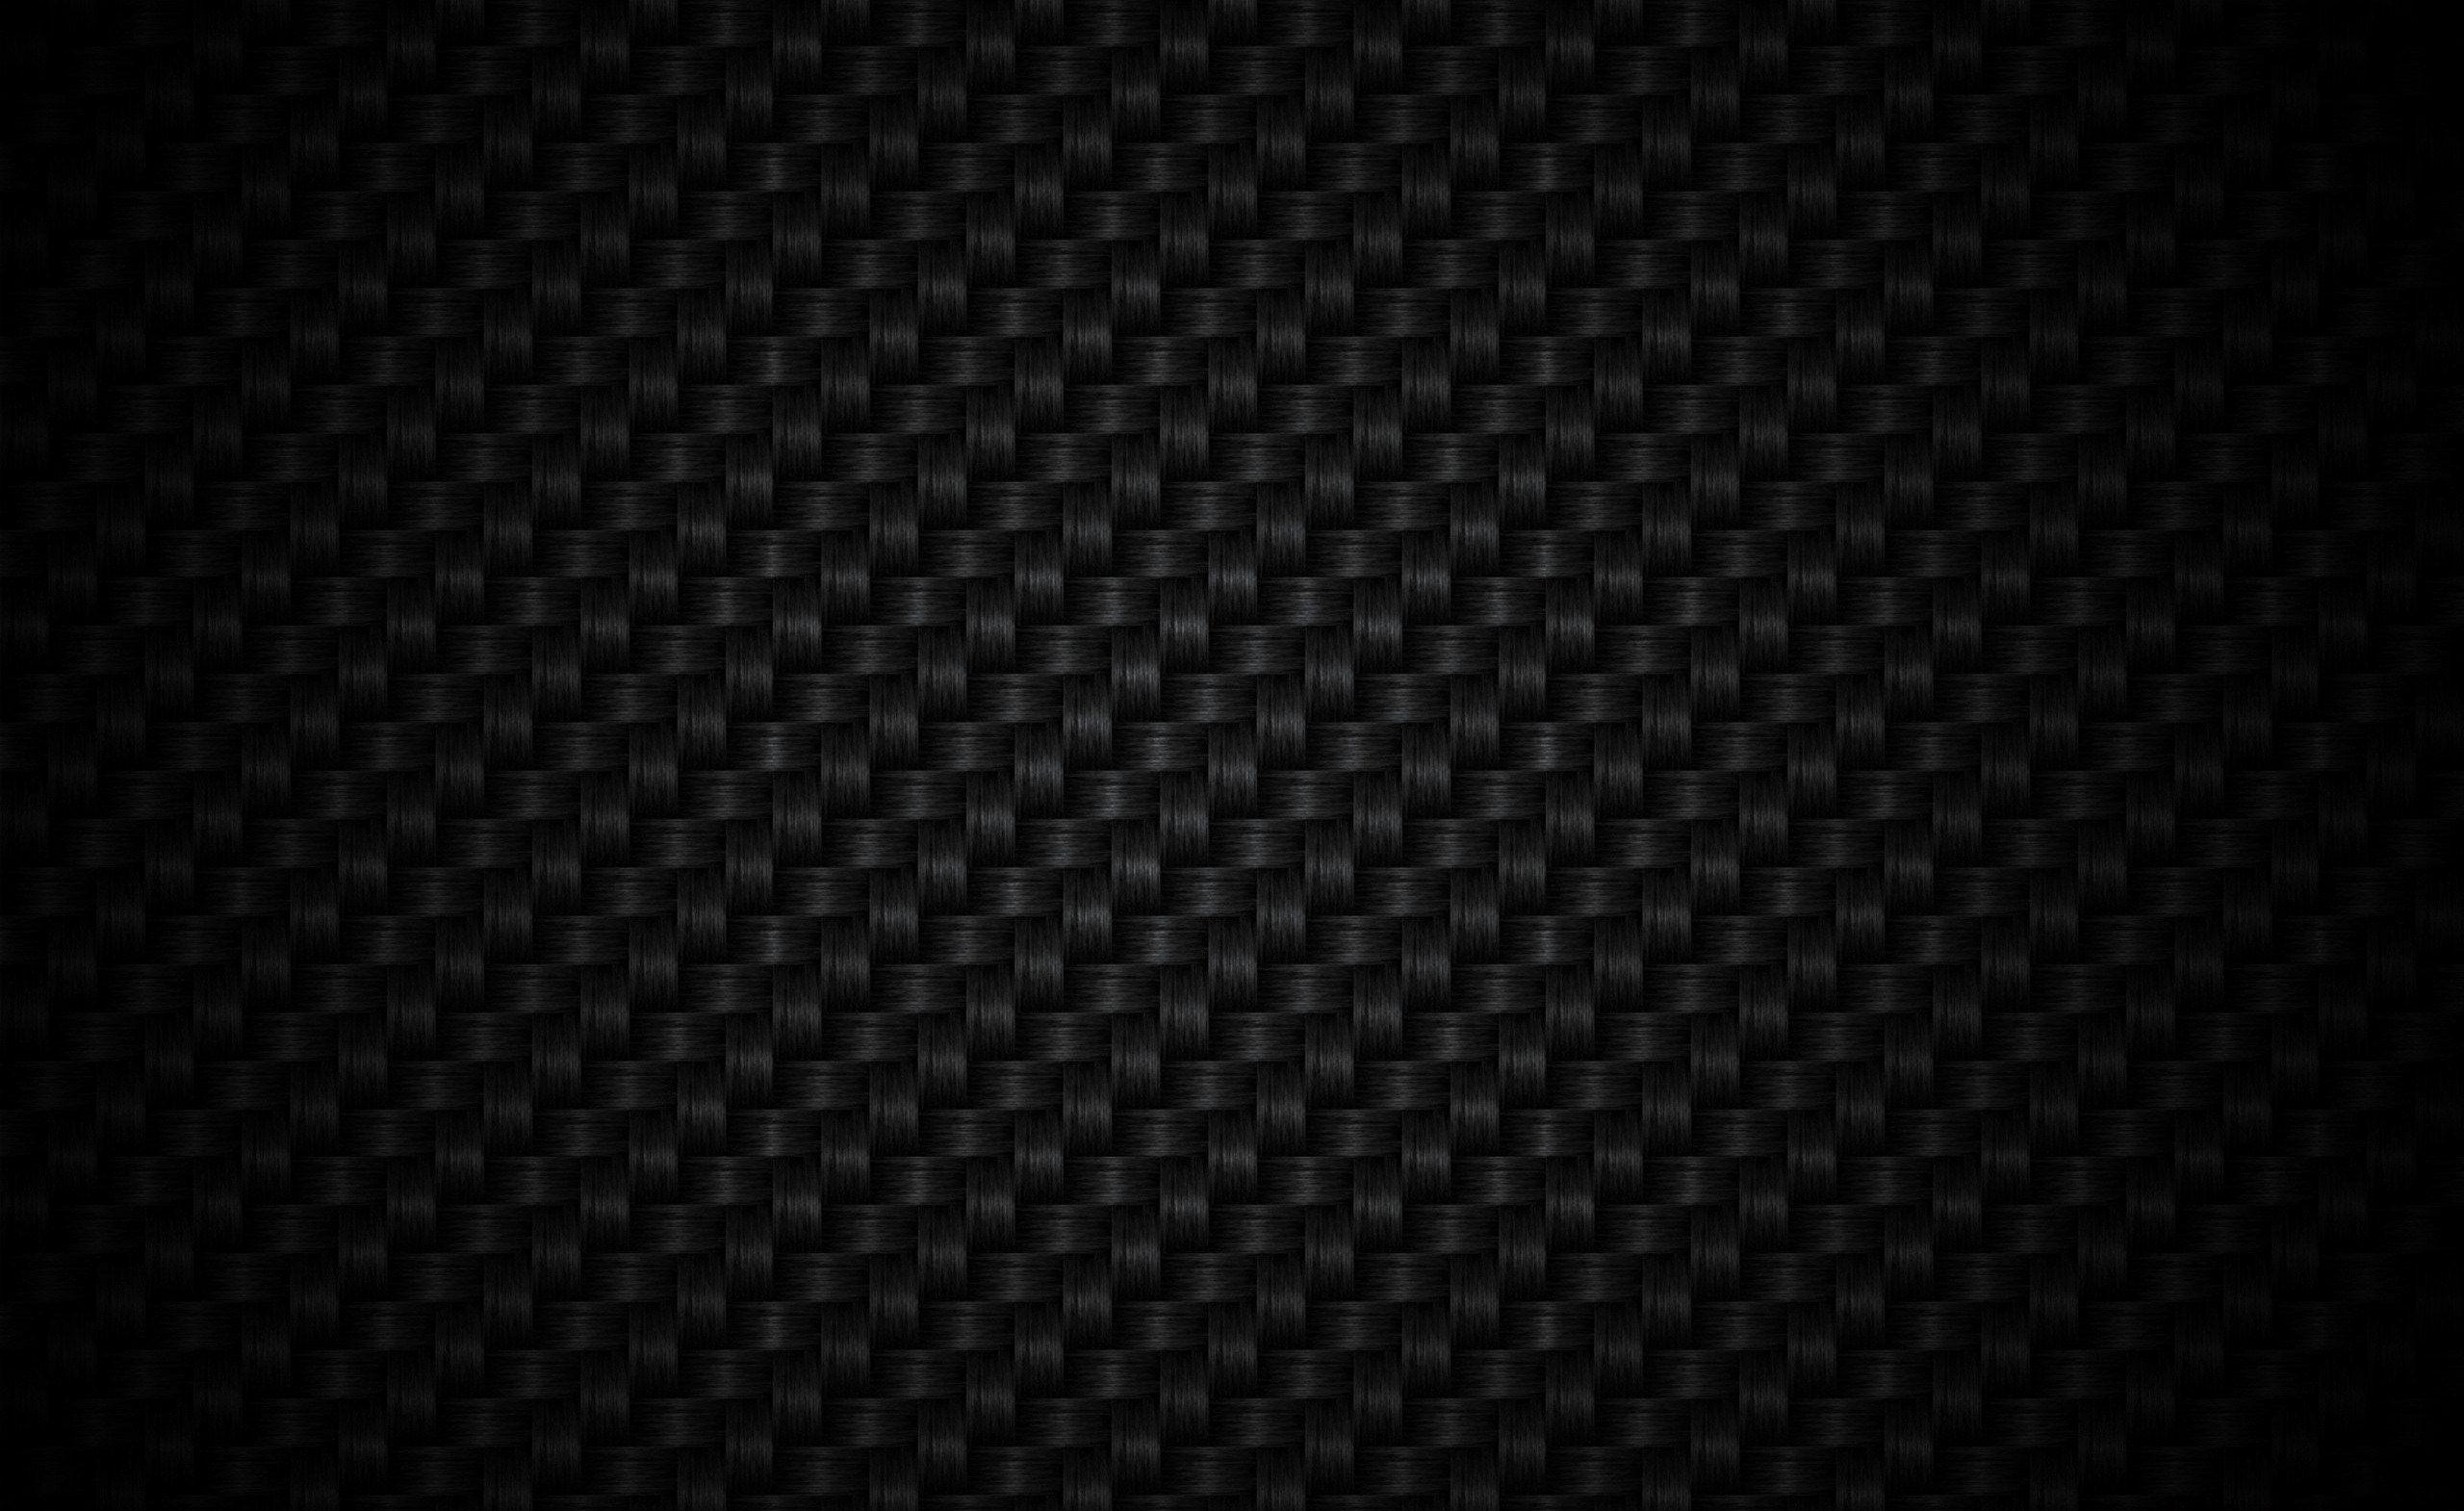 Black Texture Hd Wallpapers Photos Black Textured Wallpaper Black Wallpaper Carbon Fiber Wallpaper